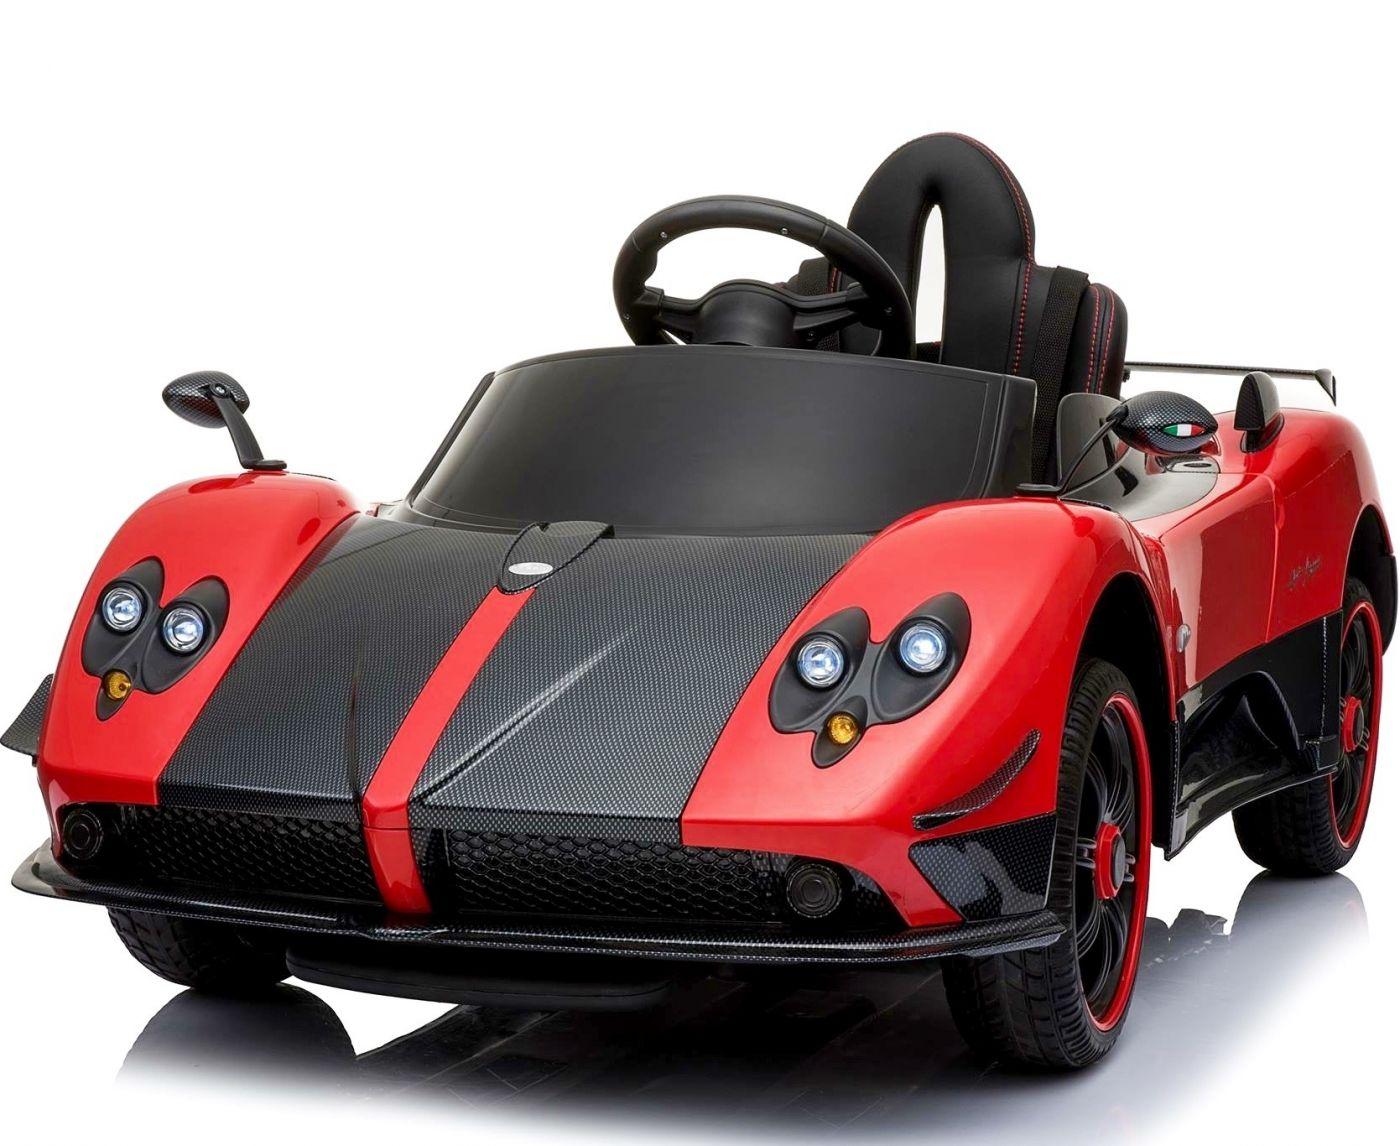 licensed pagani zonda f roadster children's 12v ride on car - red